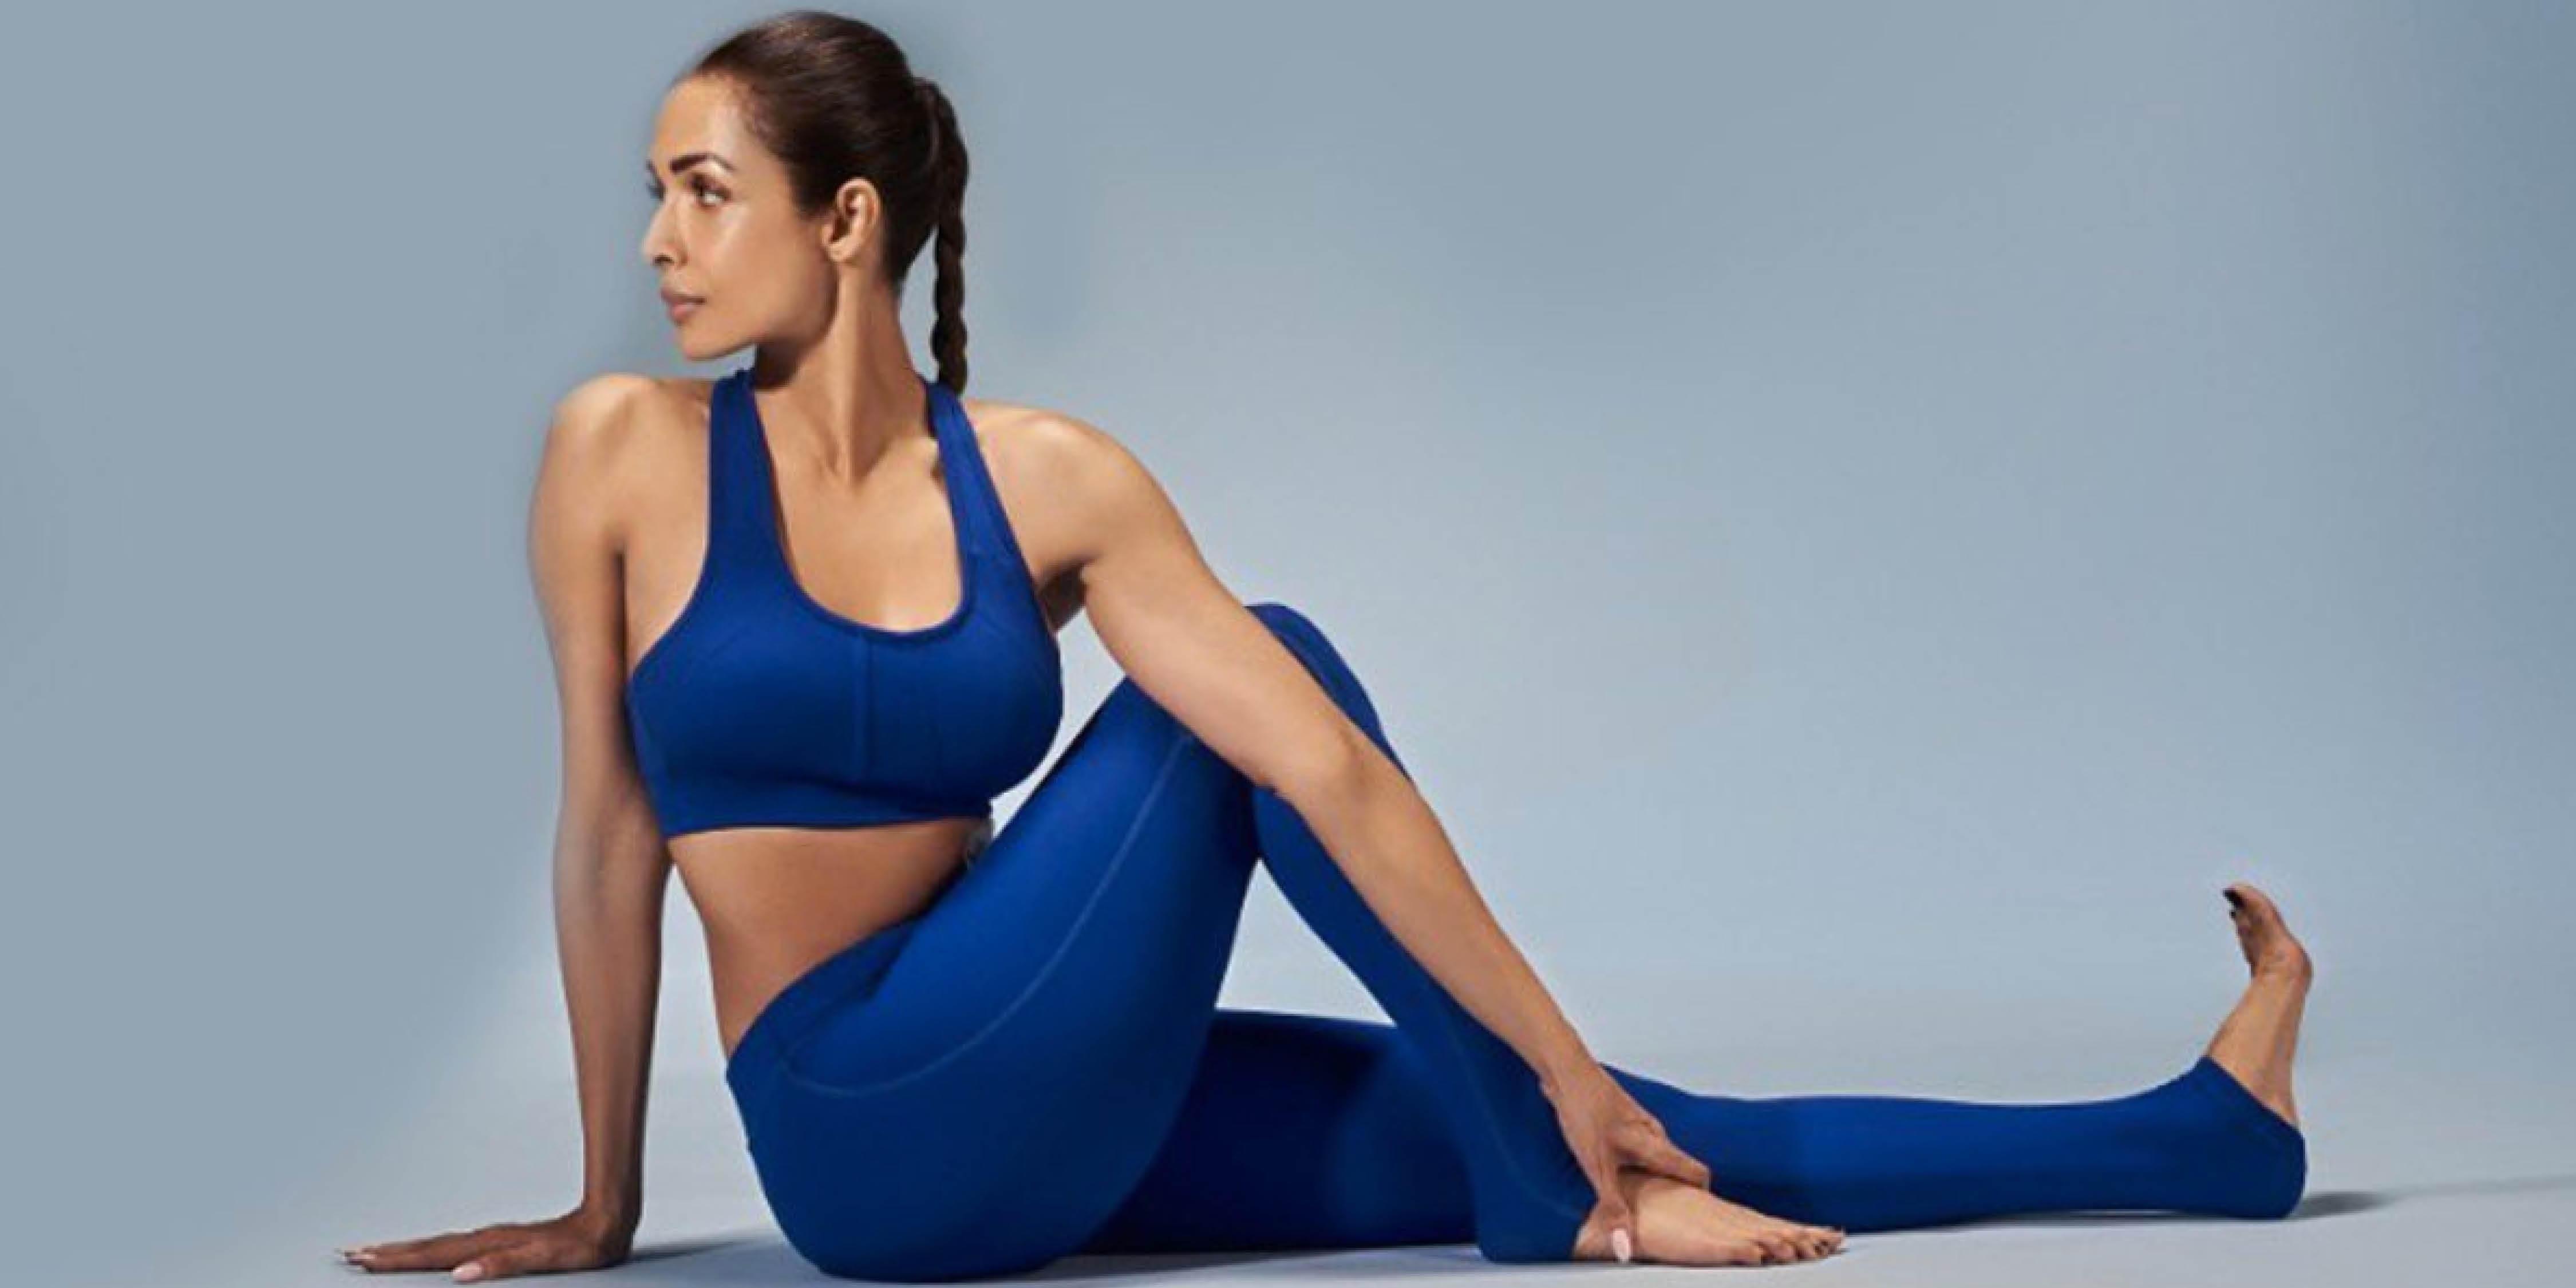 Follow Malaika Arora S Full Body Yoga Workout To Get Into Shape At Home Life Cosmopolitan India